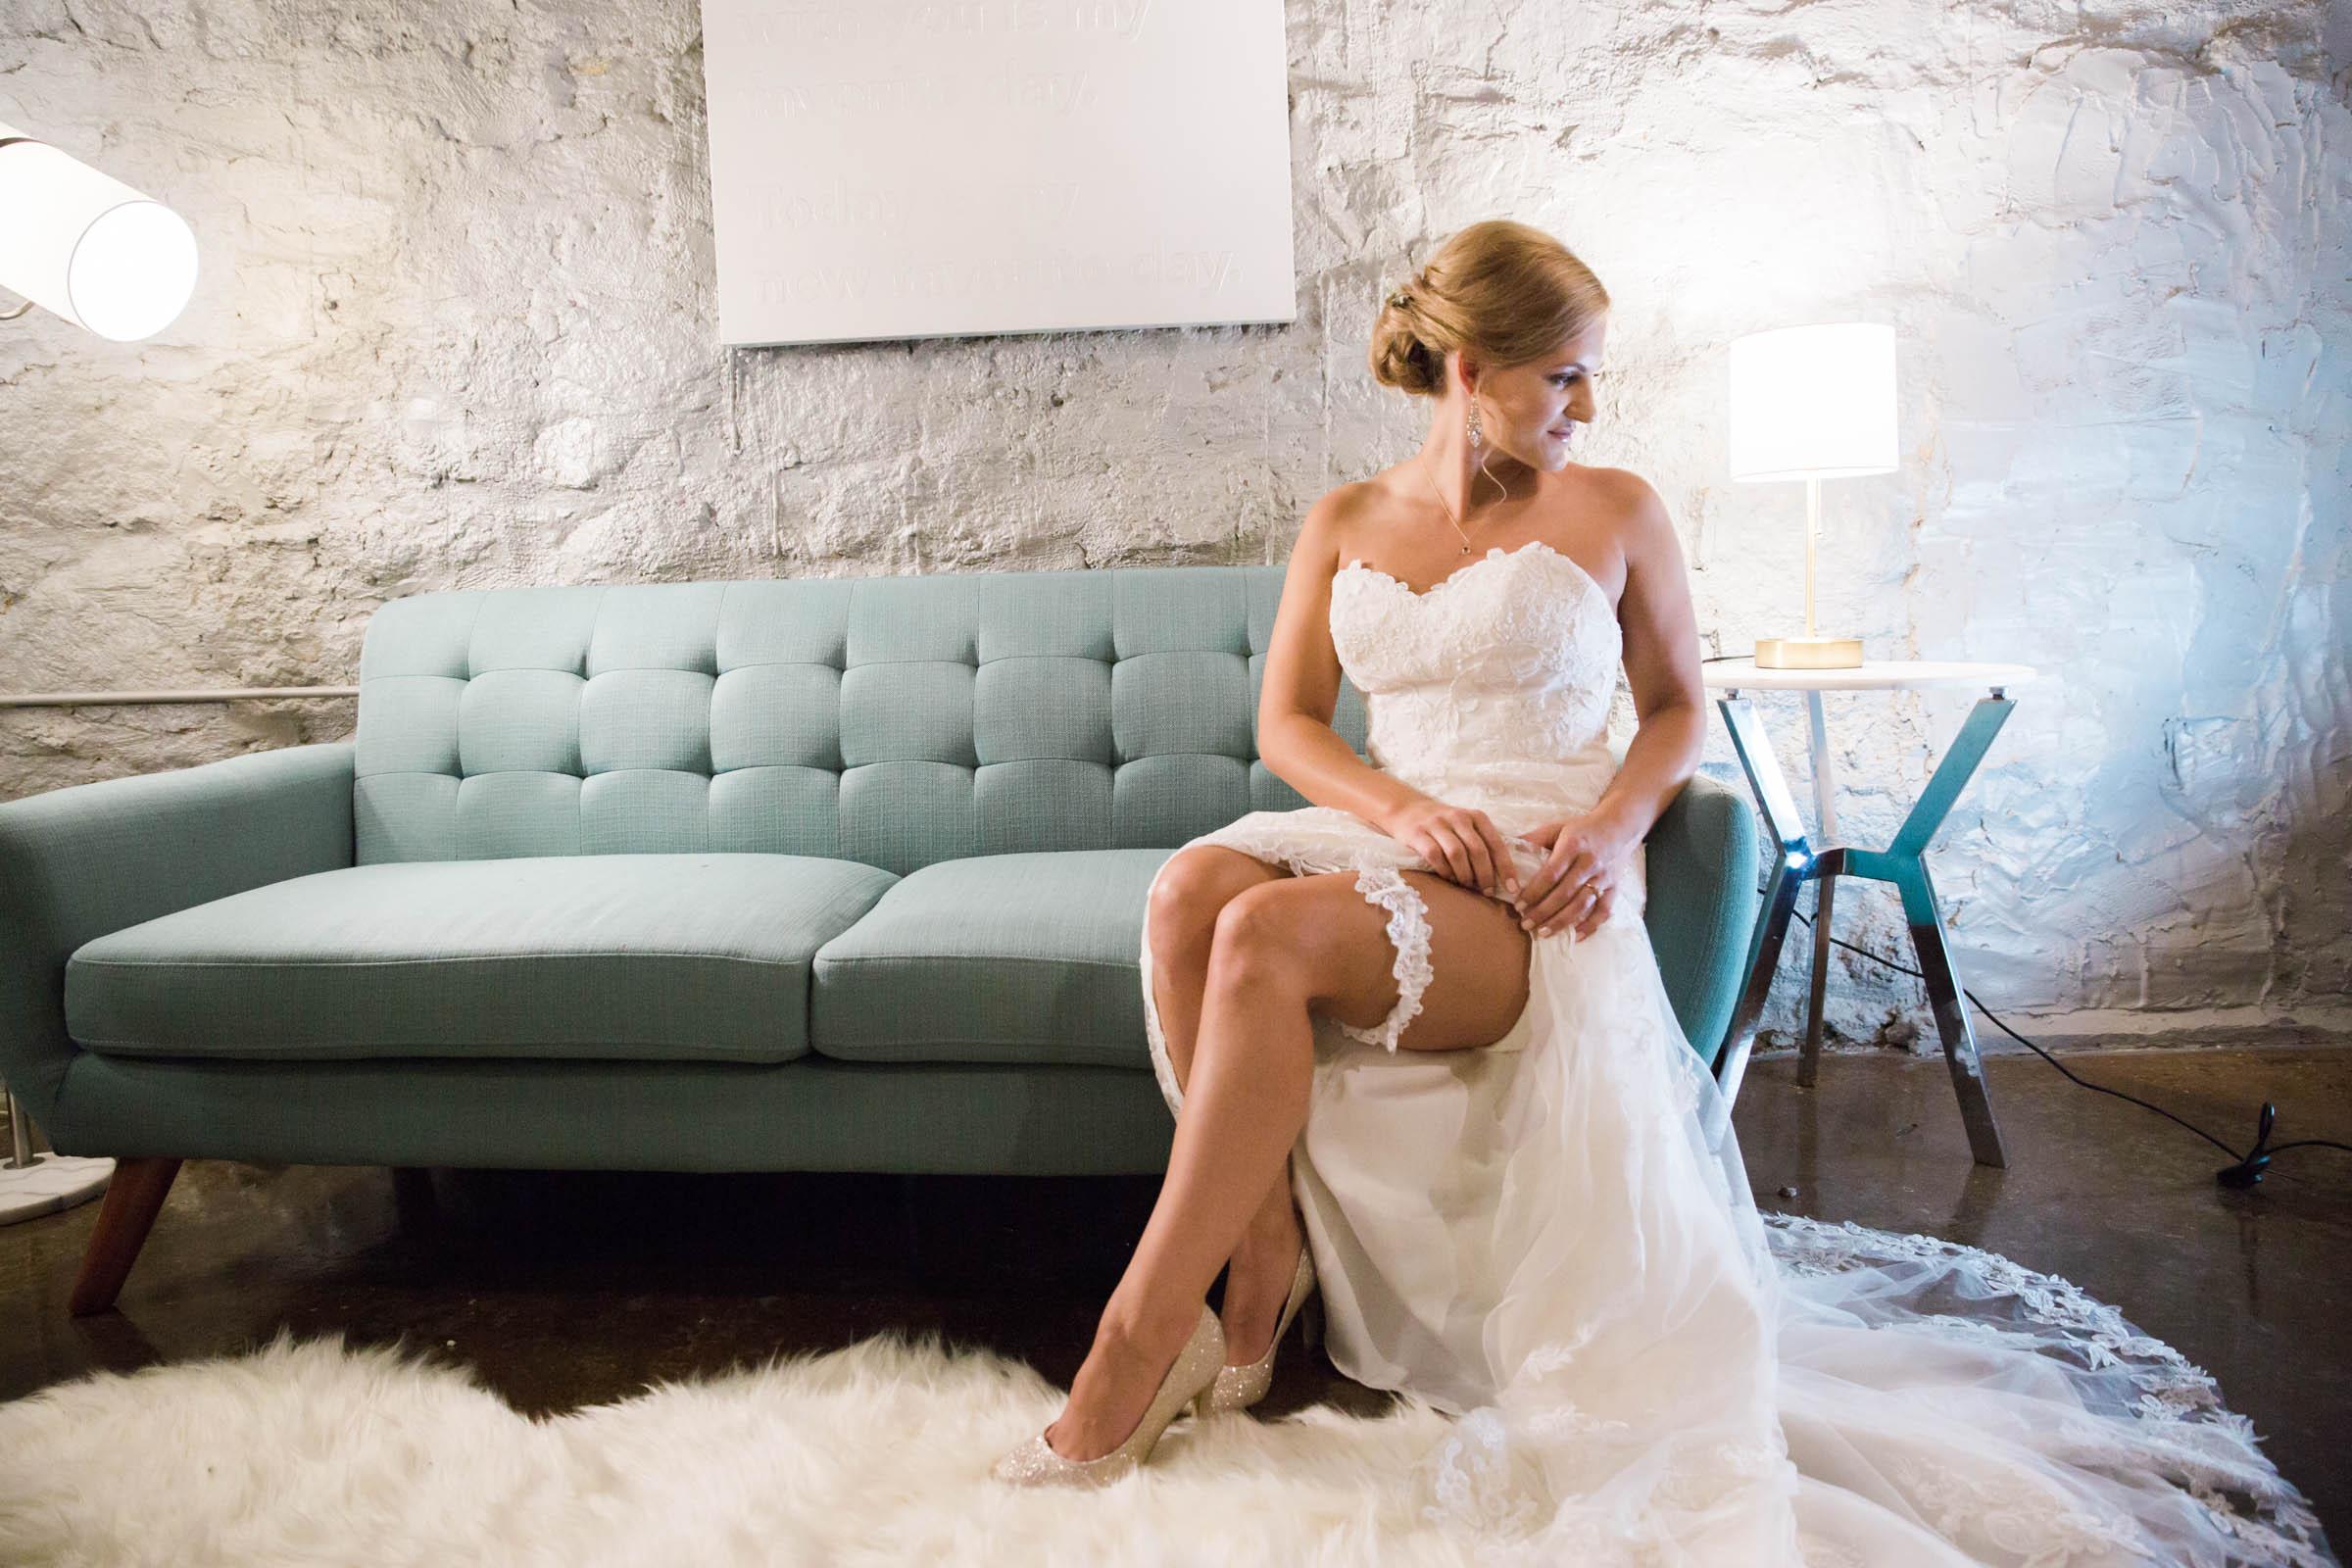 Ellicott City Wedding Photography by Megapixels Media Top Maryland Wedding Photographer Bridal Boudoir.jpg